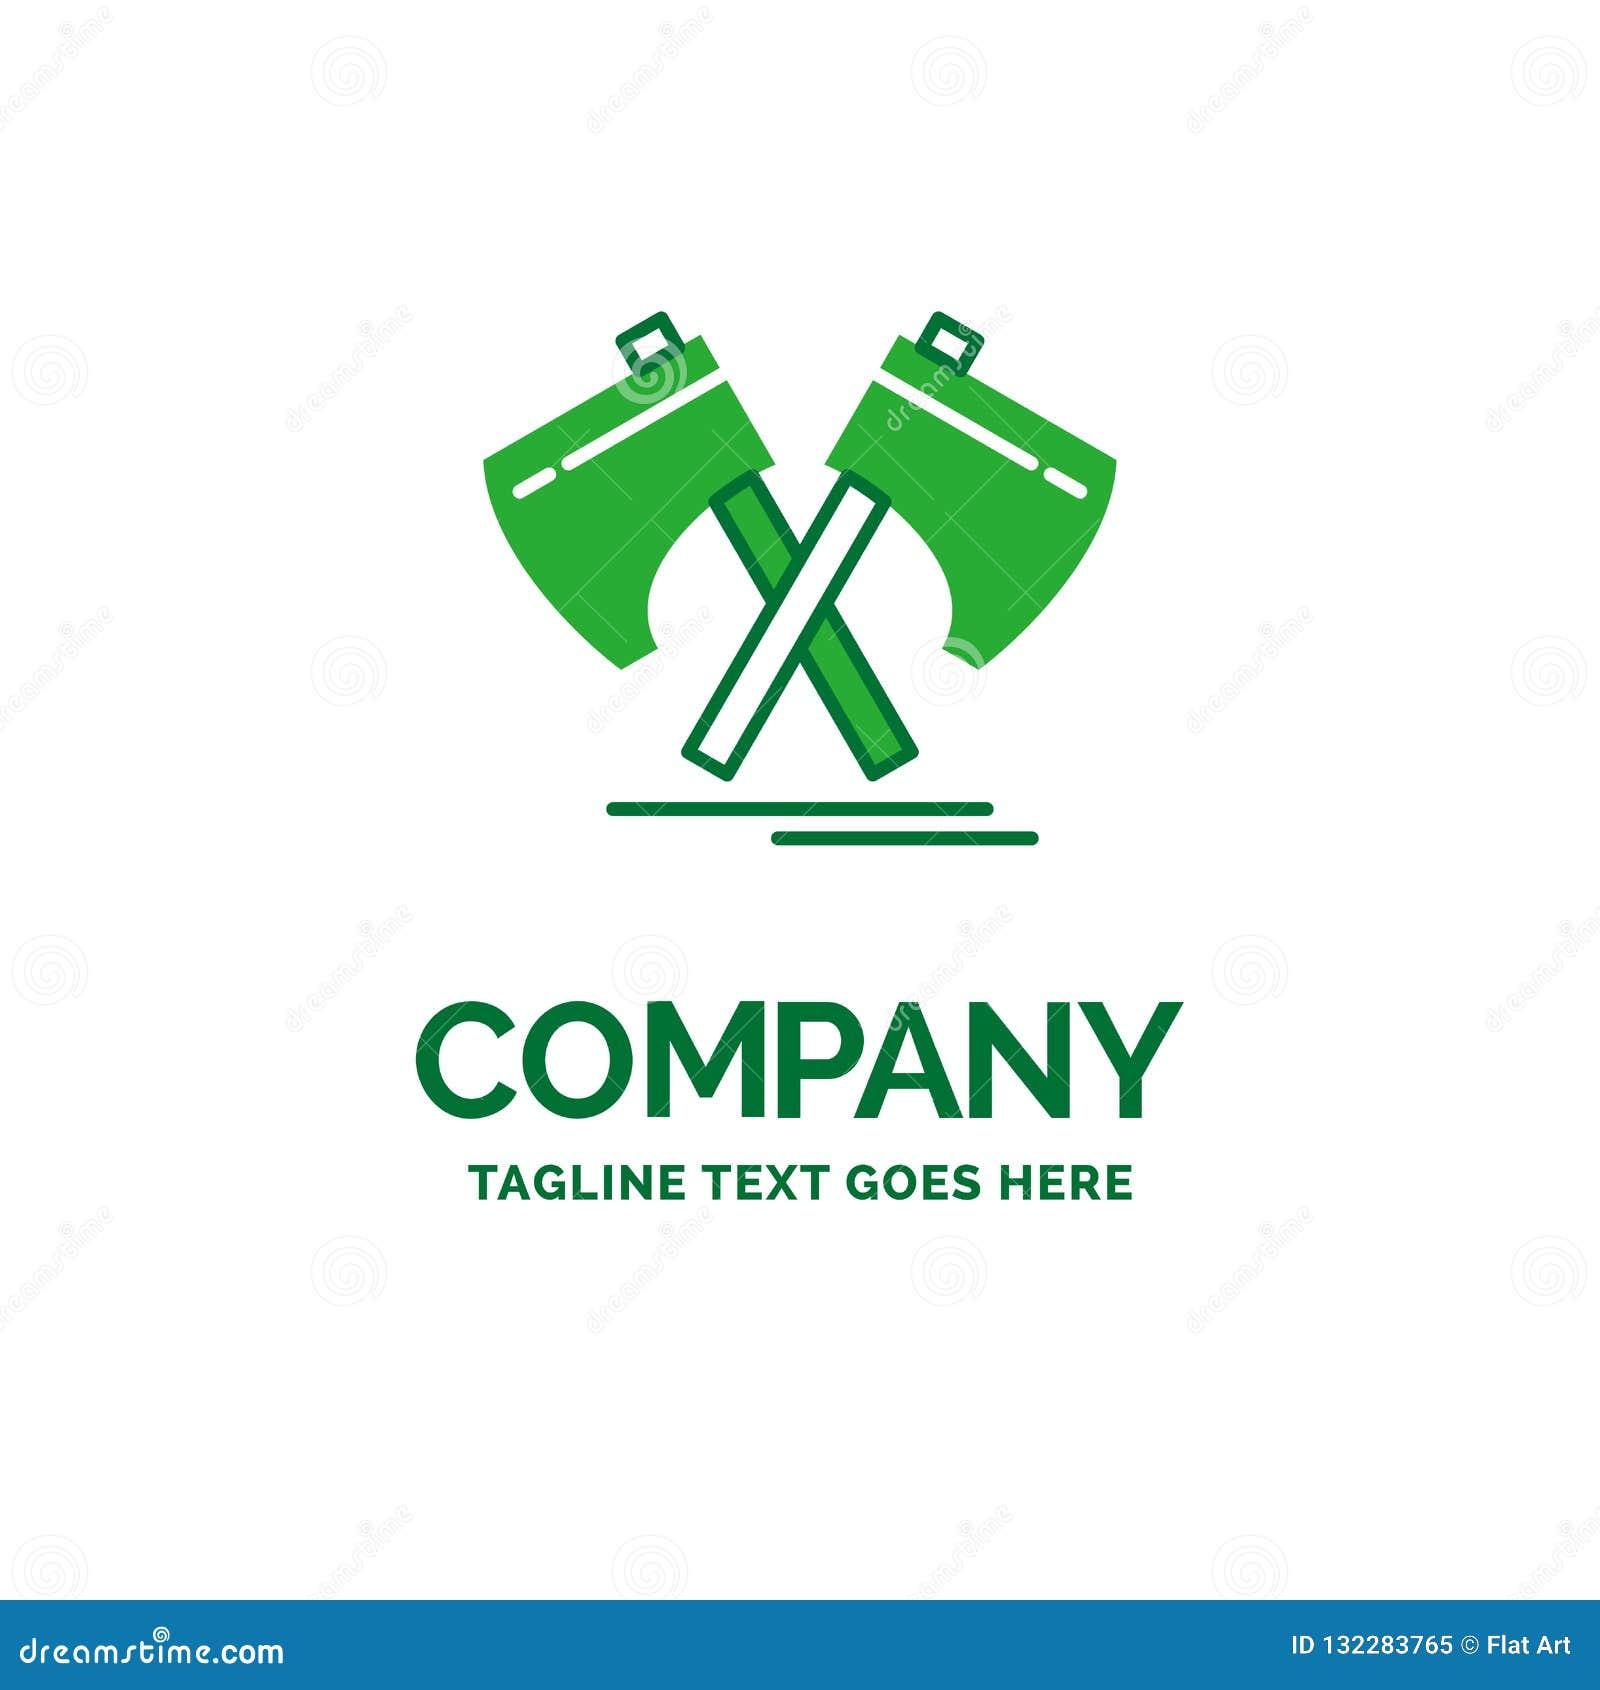 f56813da37134 Axe, hatchet, tool, cutter, viking Flat Business Logo template. Creative  Green Brand Name Design. More similar stock illustrations